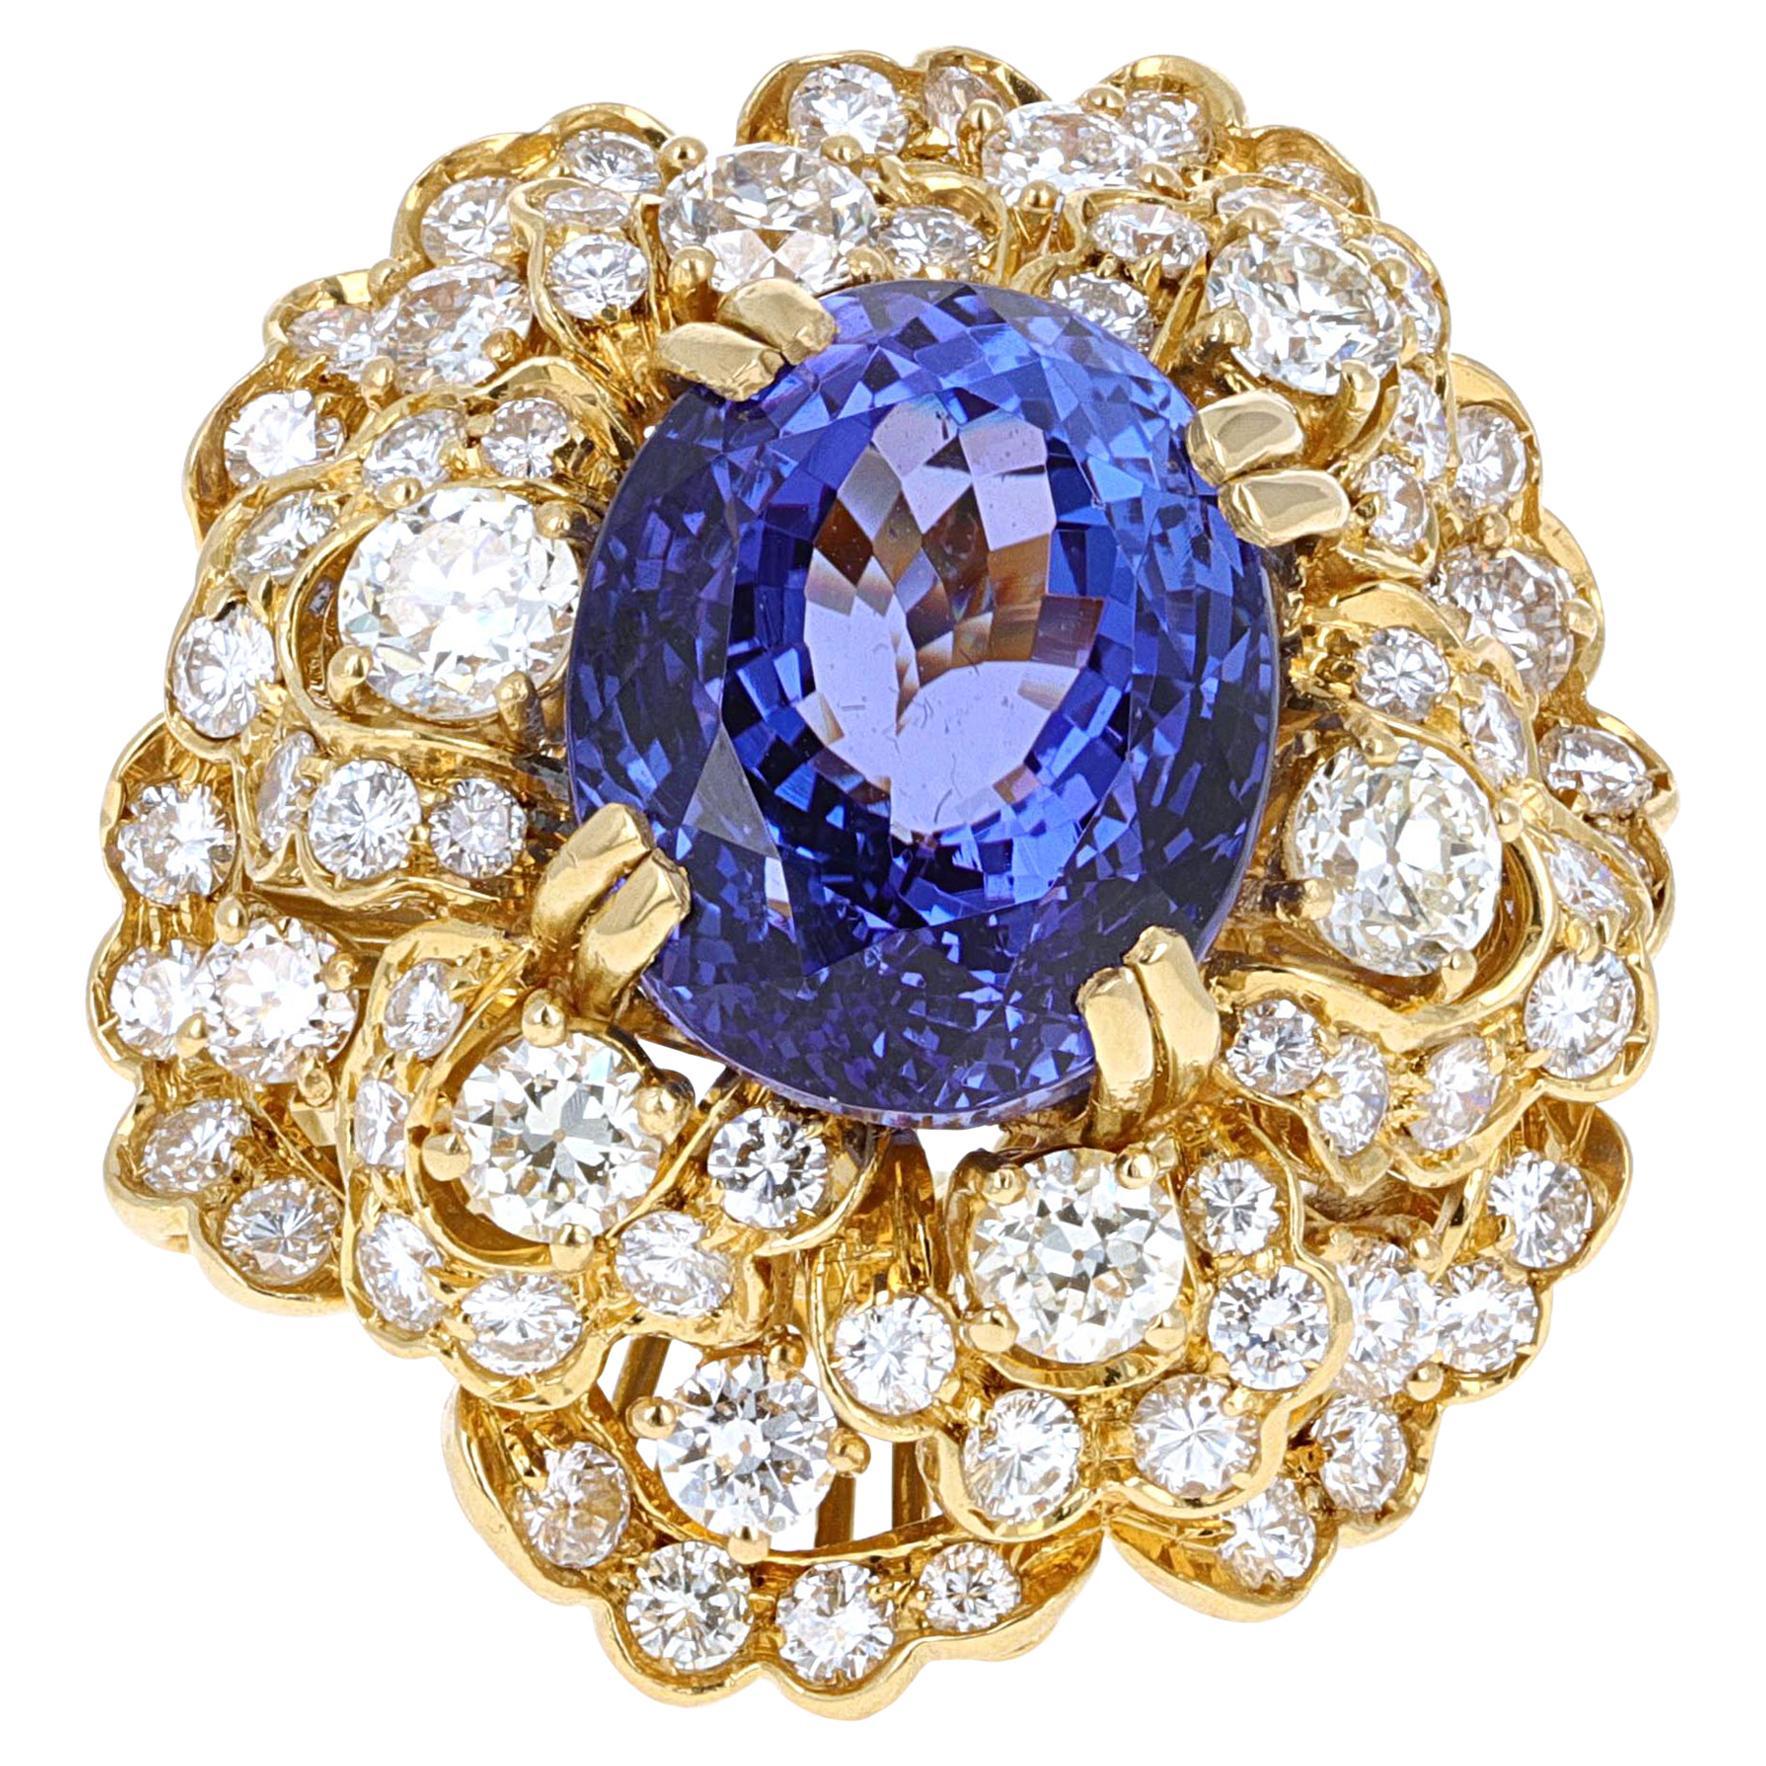 12.99 Carat Tanzanite and Diamond Cocktail Ring